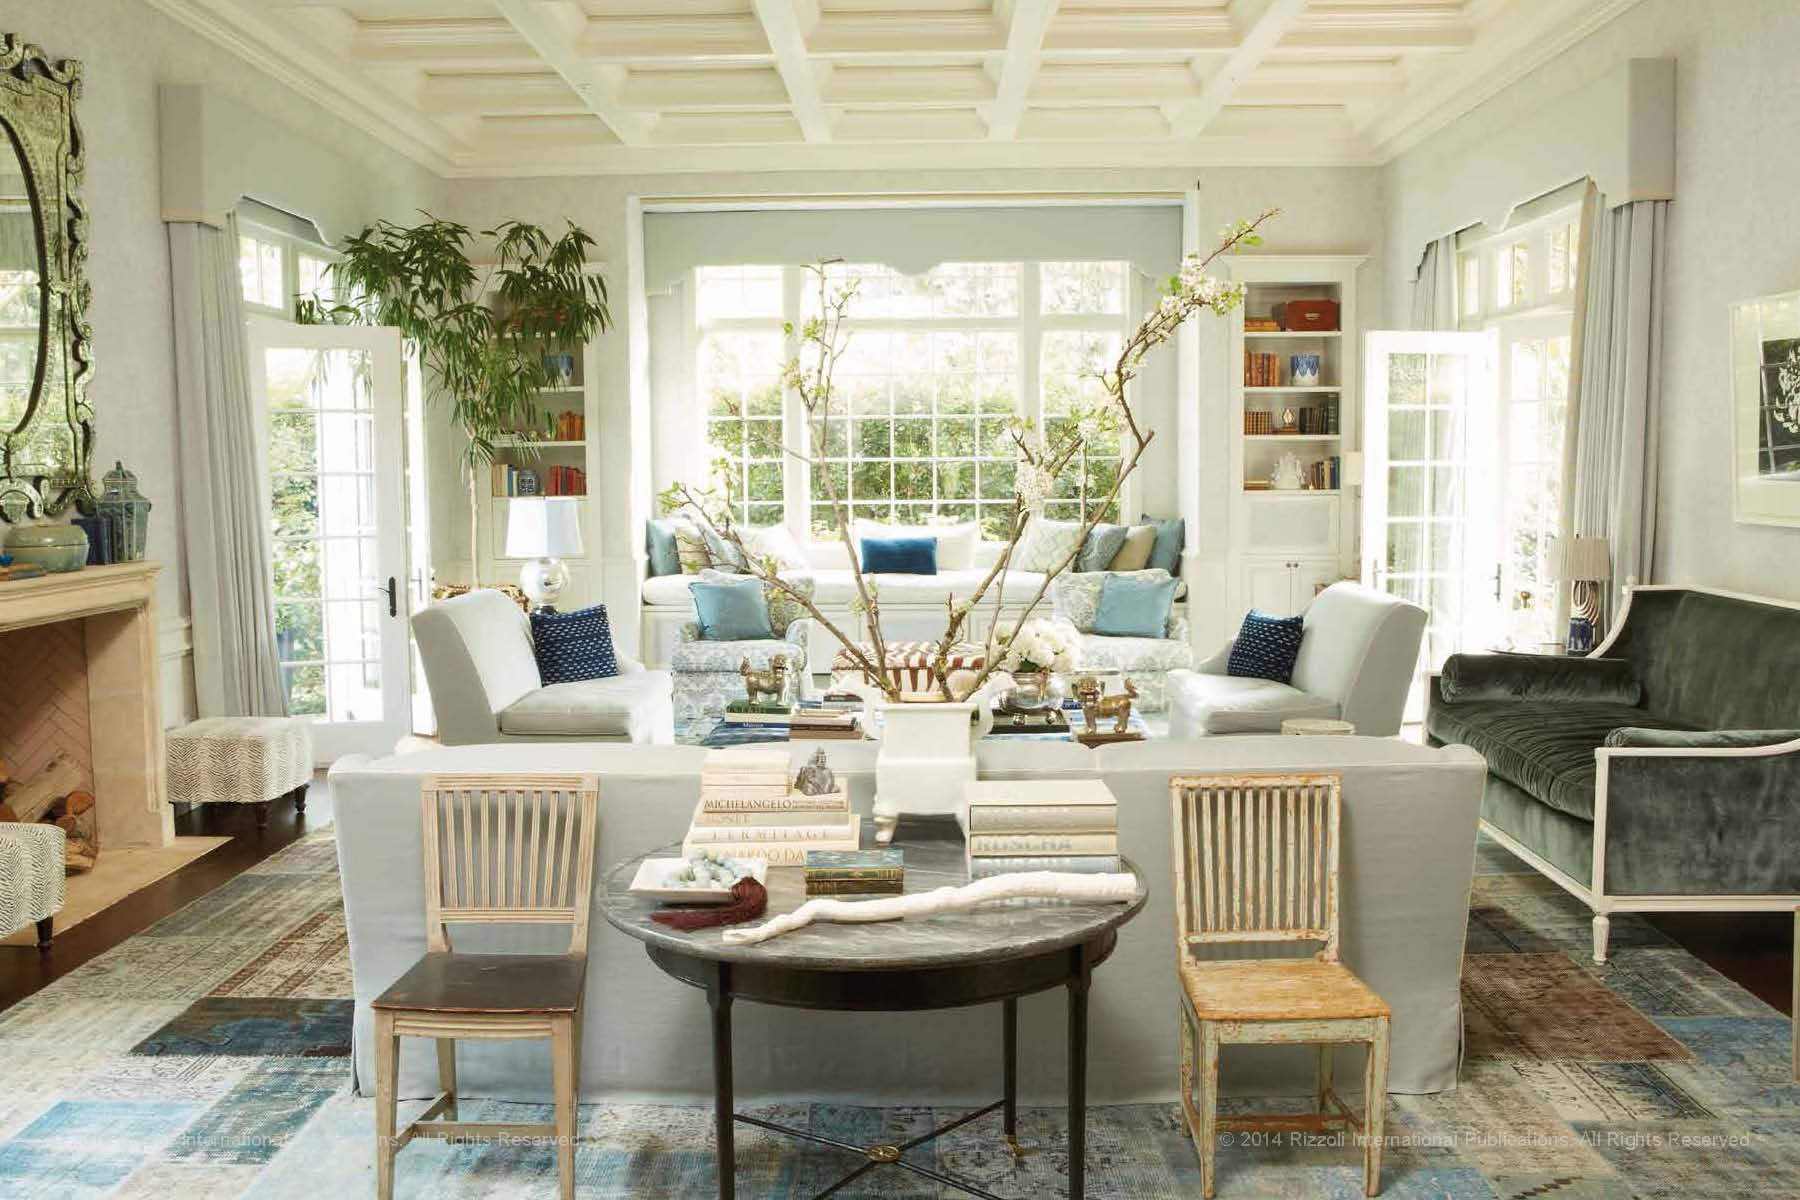 Windsor Smith Homefront Design For Modern Living Smith Windsor Paltrow Gwyneth 9780847843626 Amazon Com Books